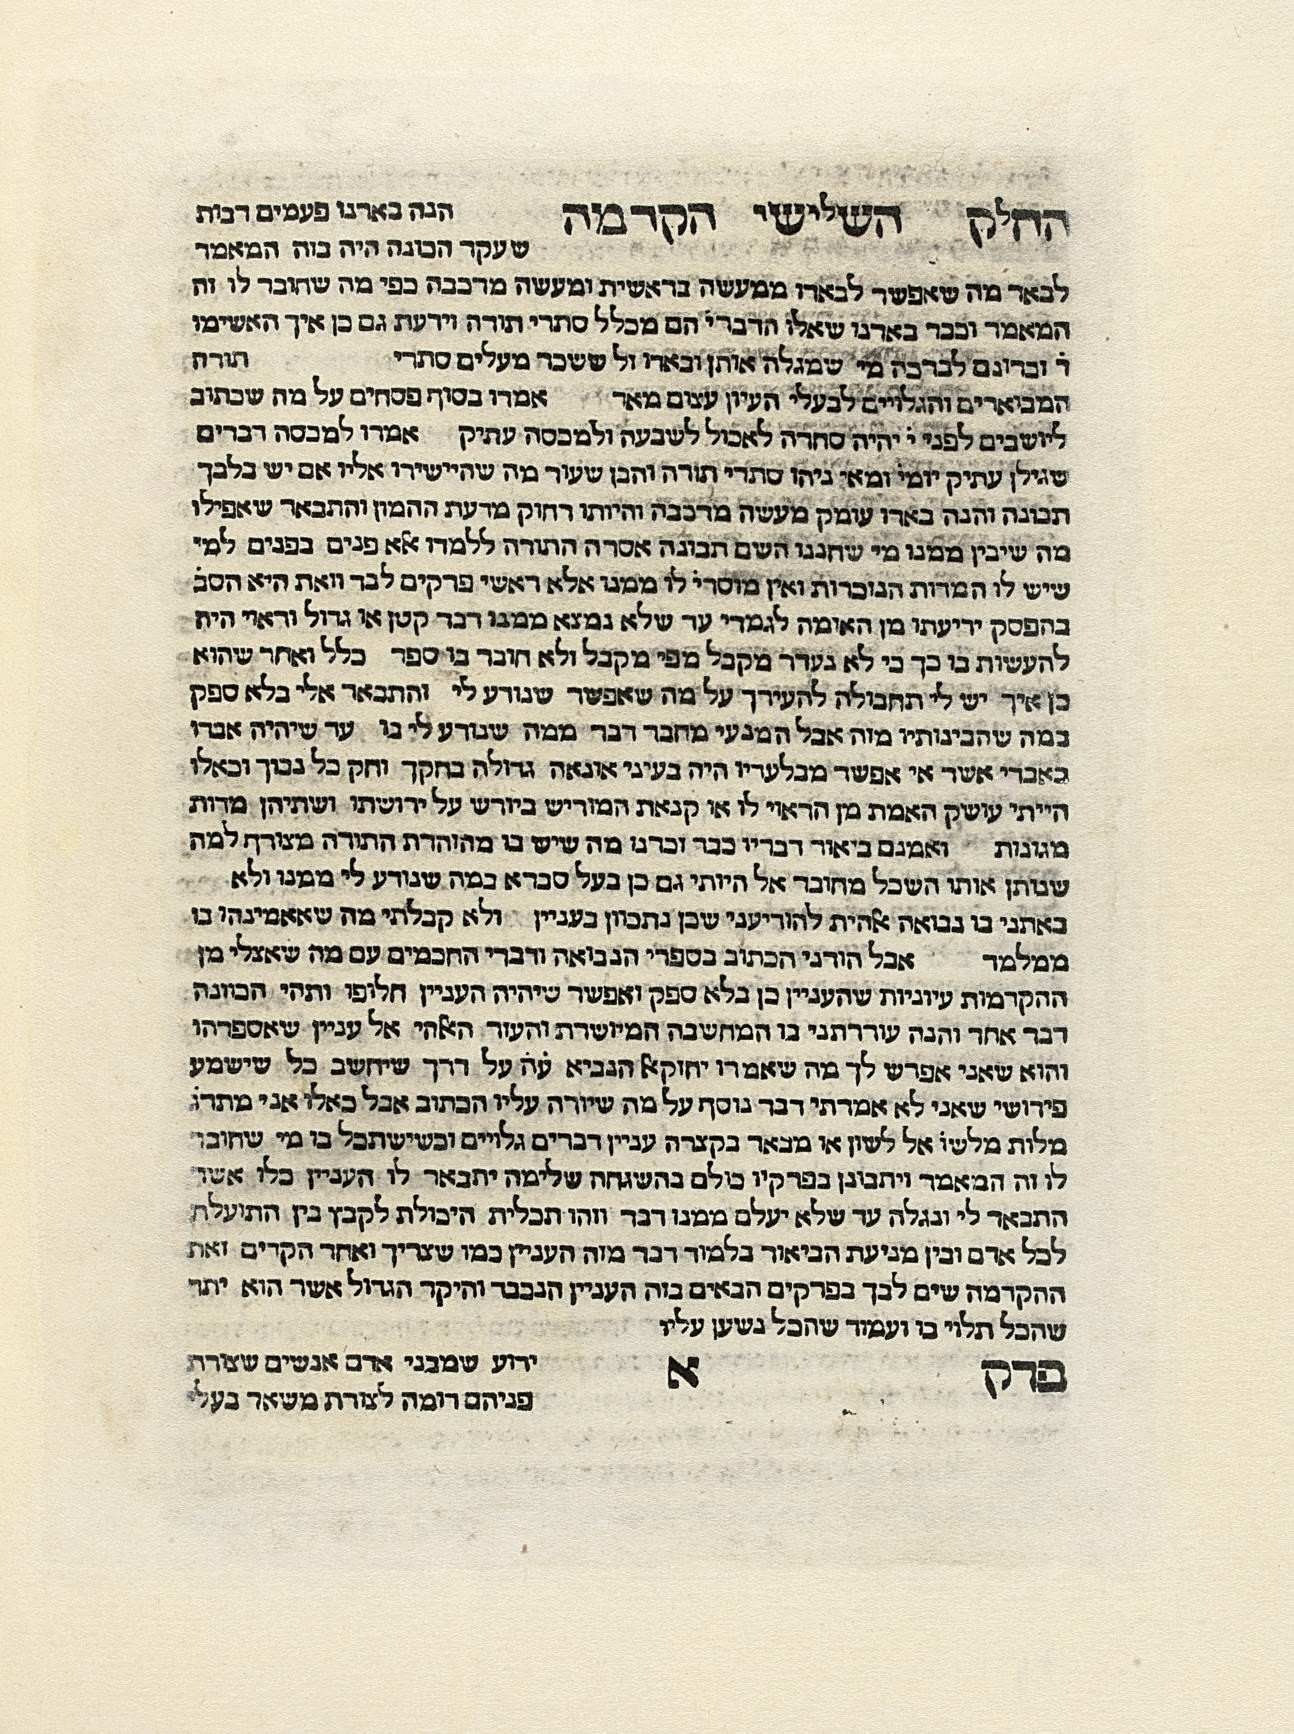 MAIMONIDES (1138-1204). Moreh